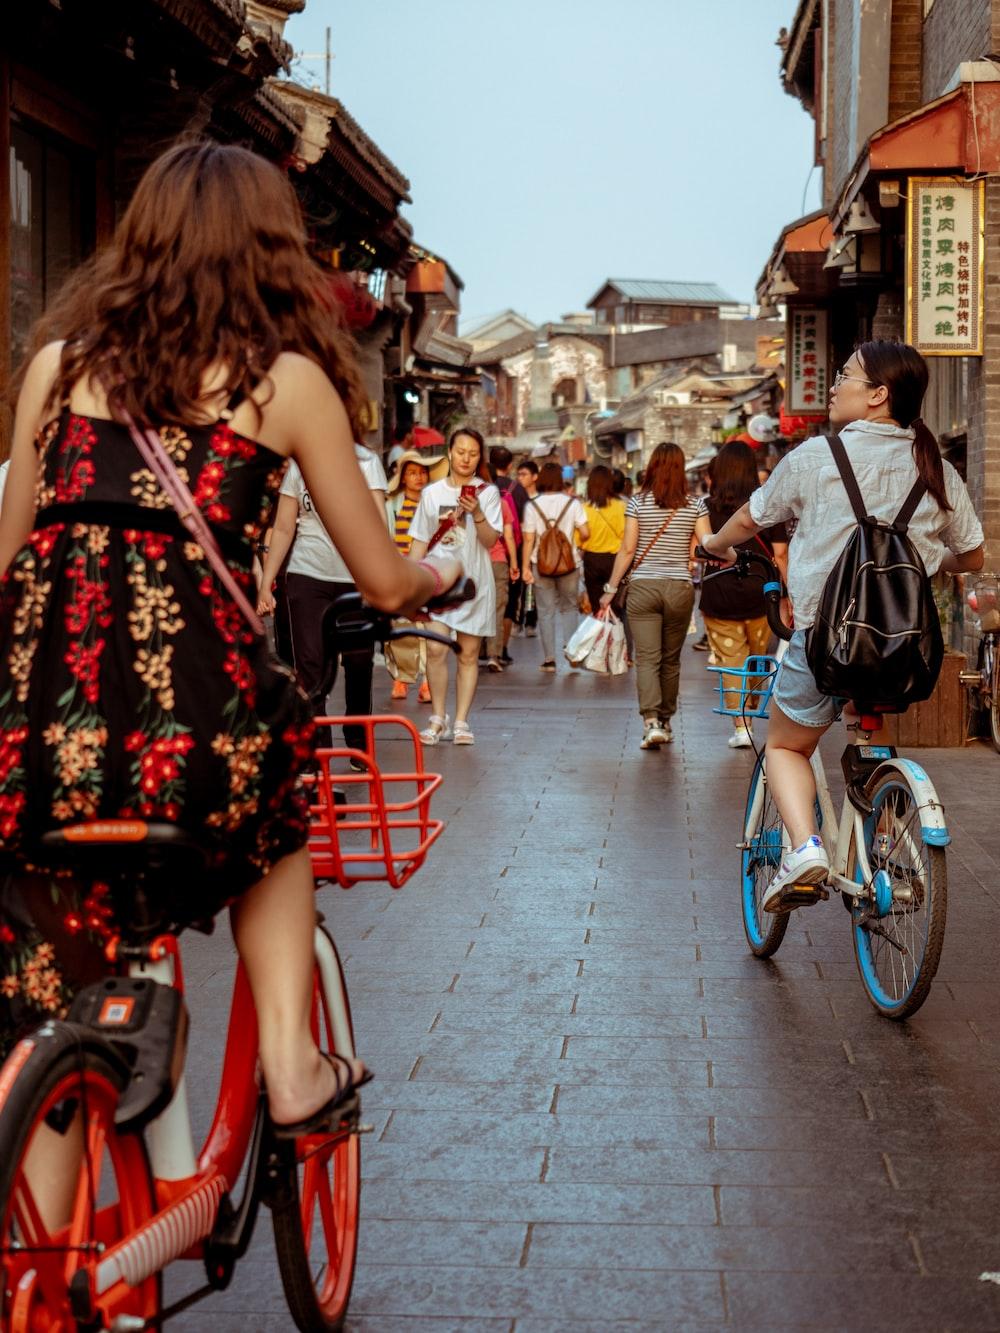 woman wearing dress riding bicycle